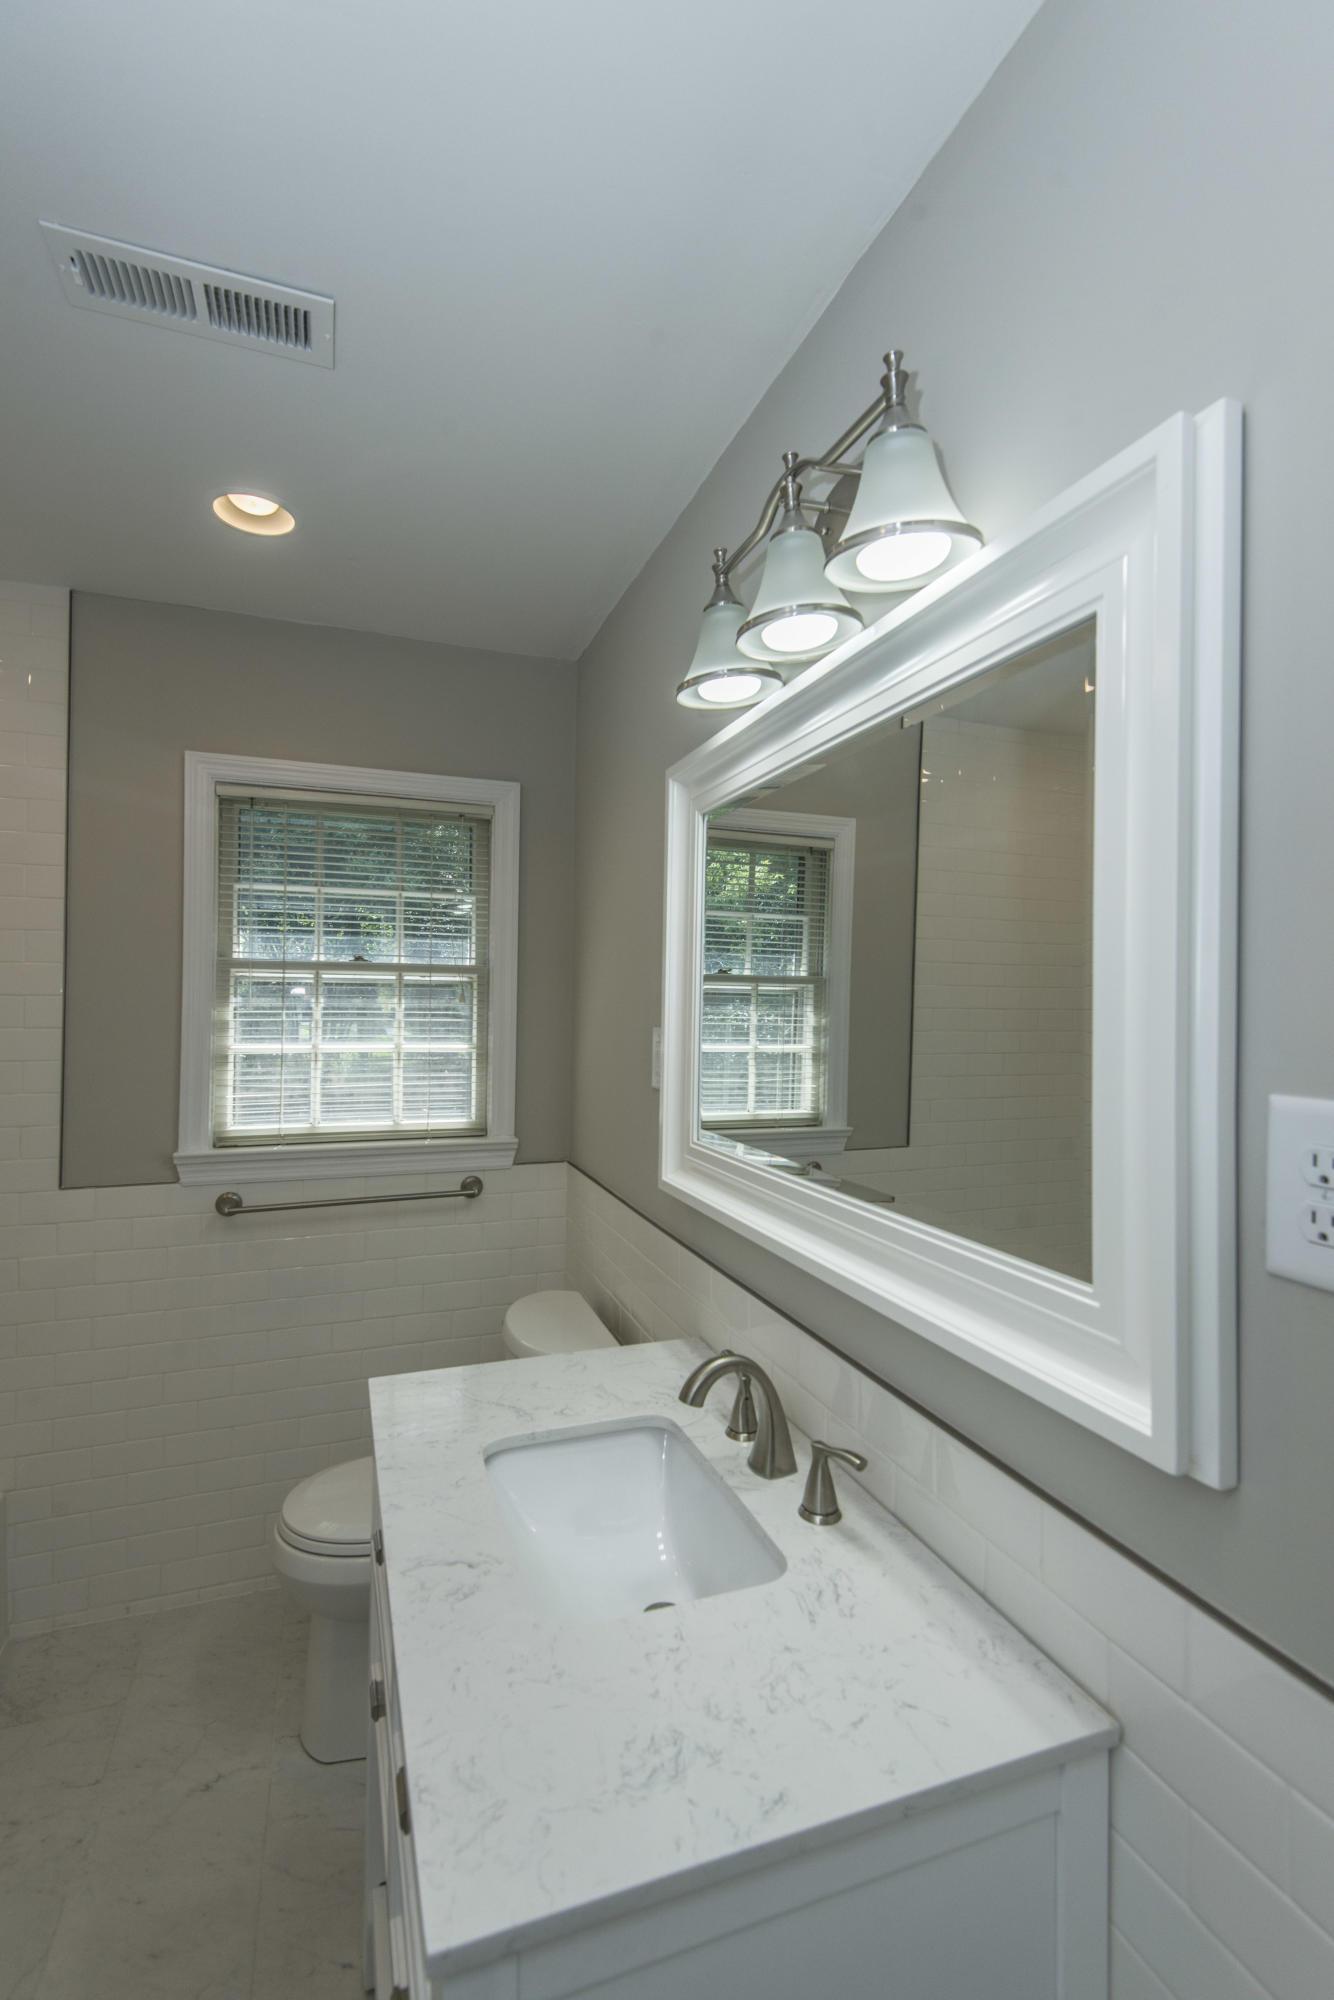 Rotherwood Estates Homes For Sale - 373 Wedgewood, Charleston, SC - 33